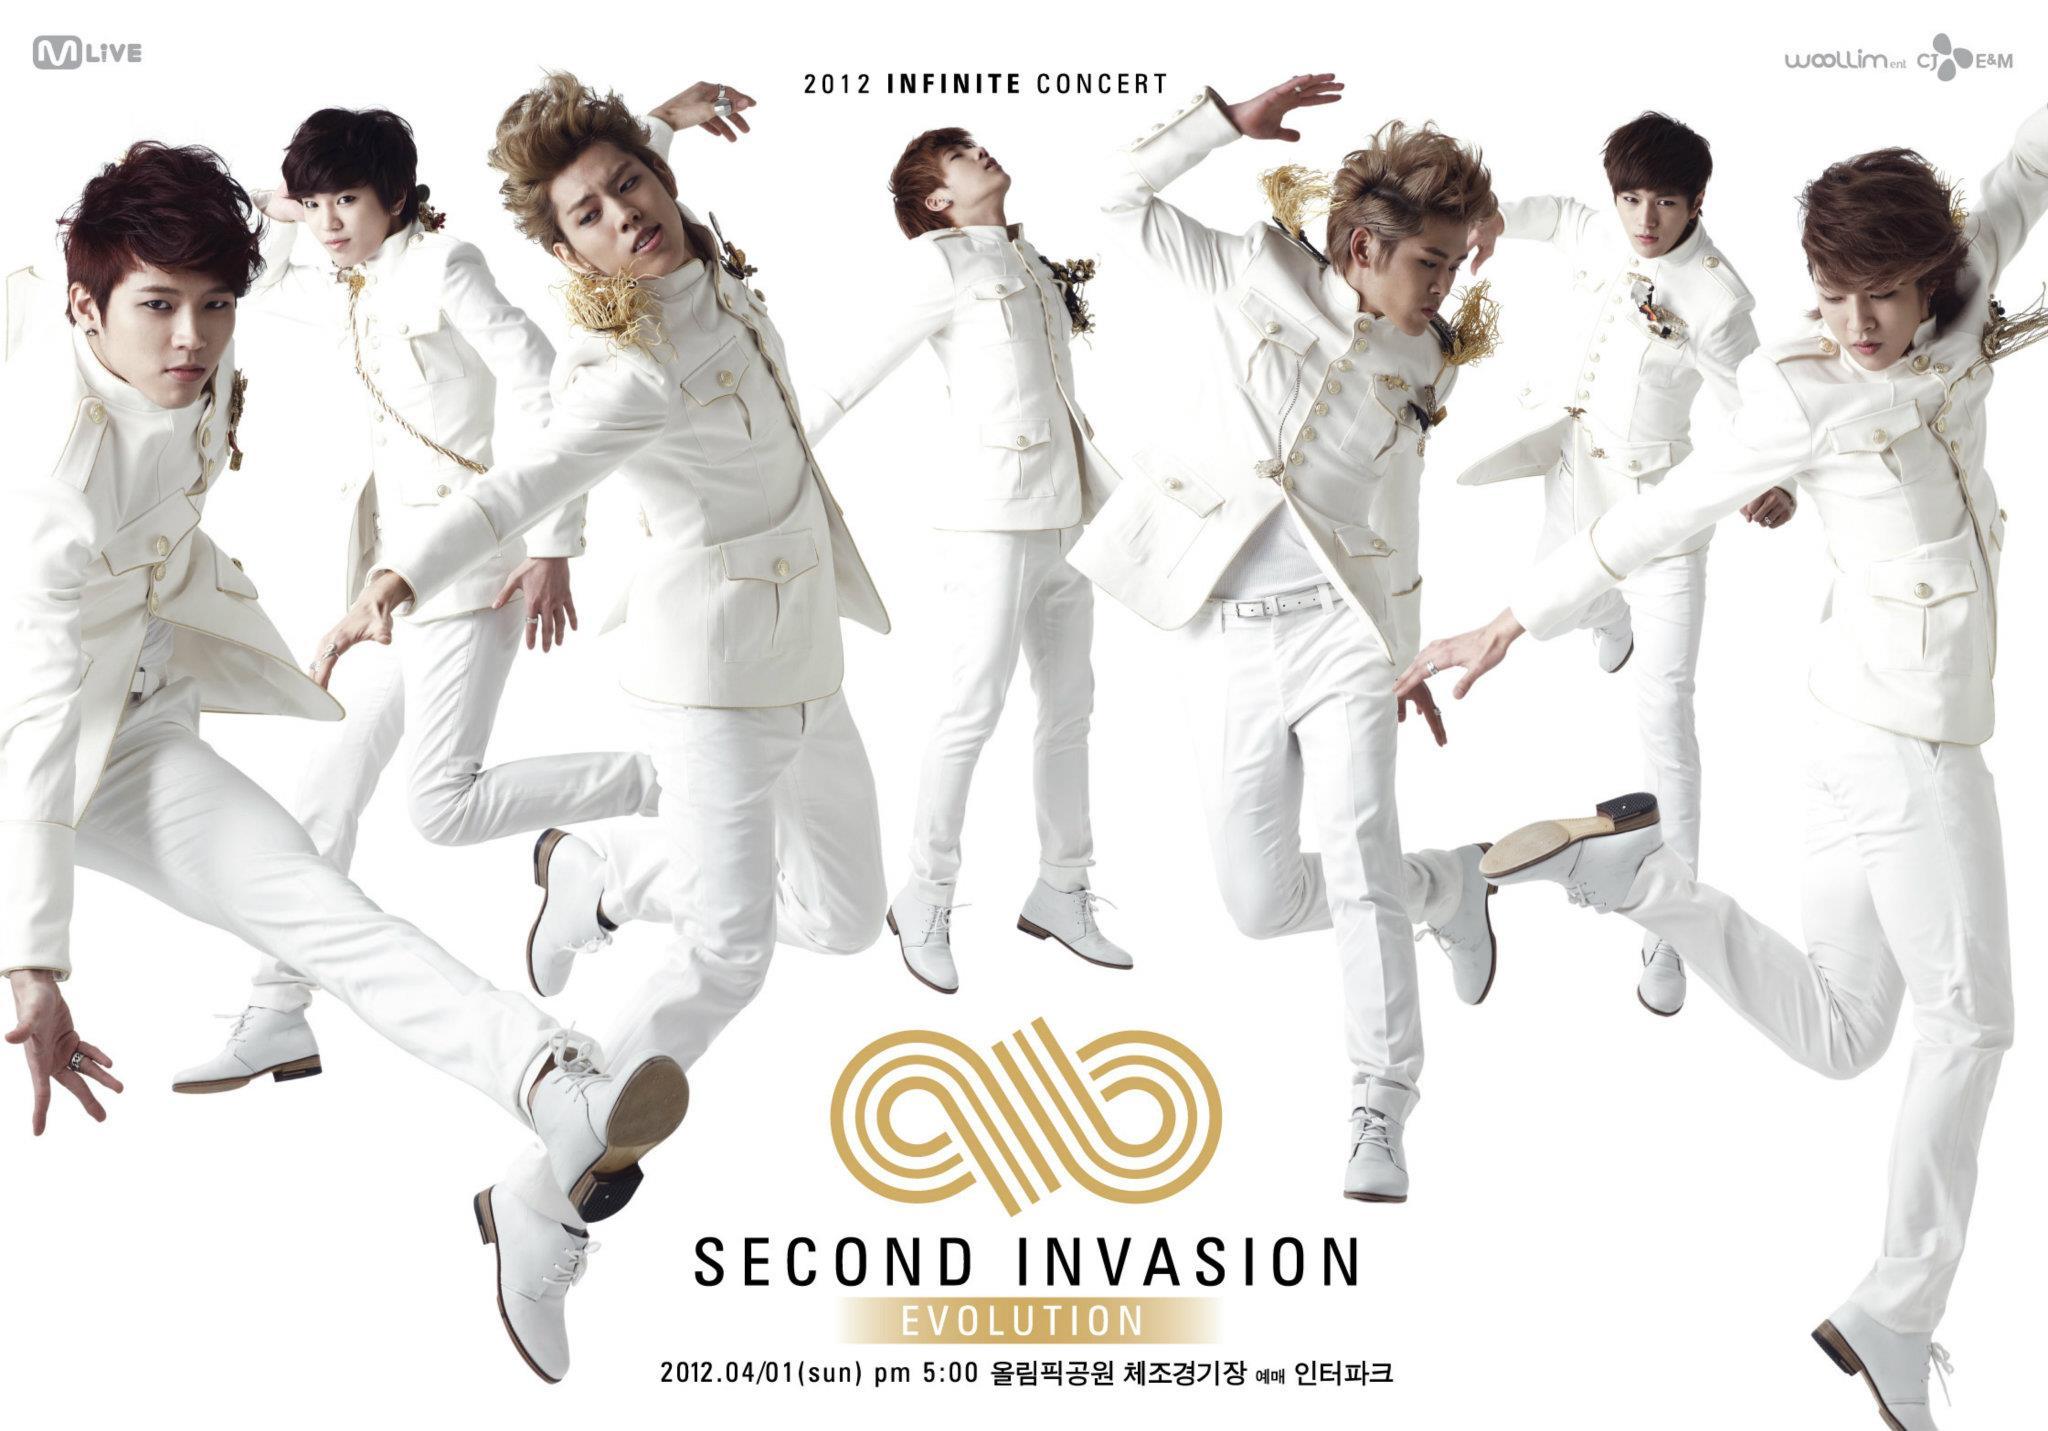 2012 INFINITE 雖然2011年是Infinite重要的一年,但巔峰應該屬於2012年!這年他們首次開售票演唱會,第三張迷你專輯的主打歌《追擊者(The Chaser)》獲得各大音樂節目7個第一,是非常風光的一年!